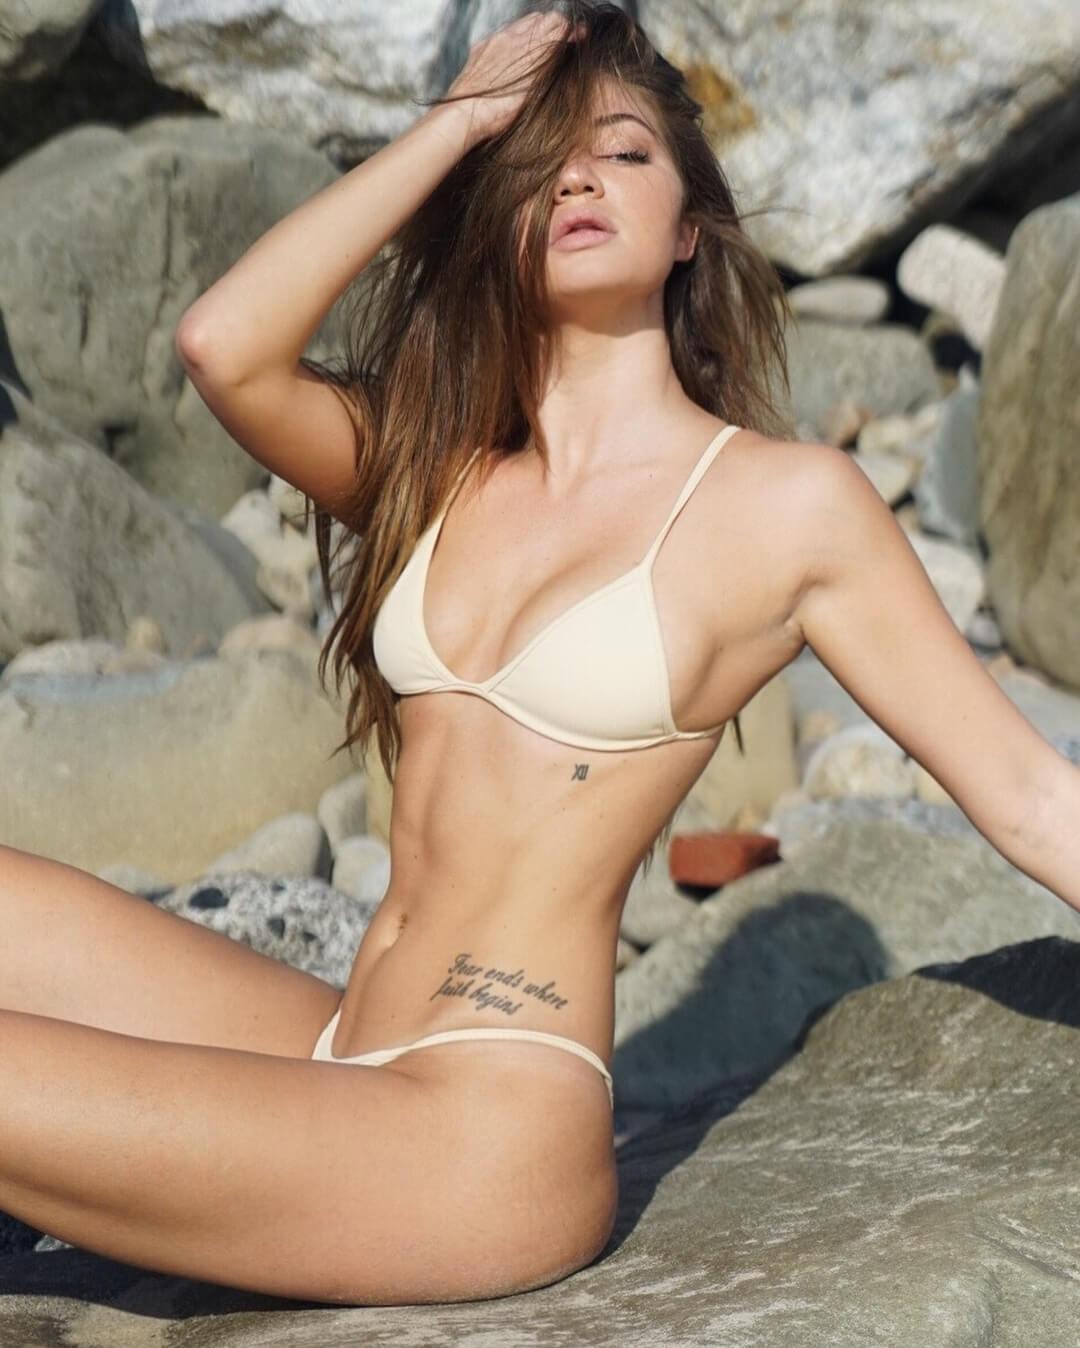 Erika Costell sexy bikini pictures